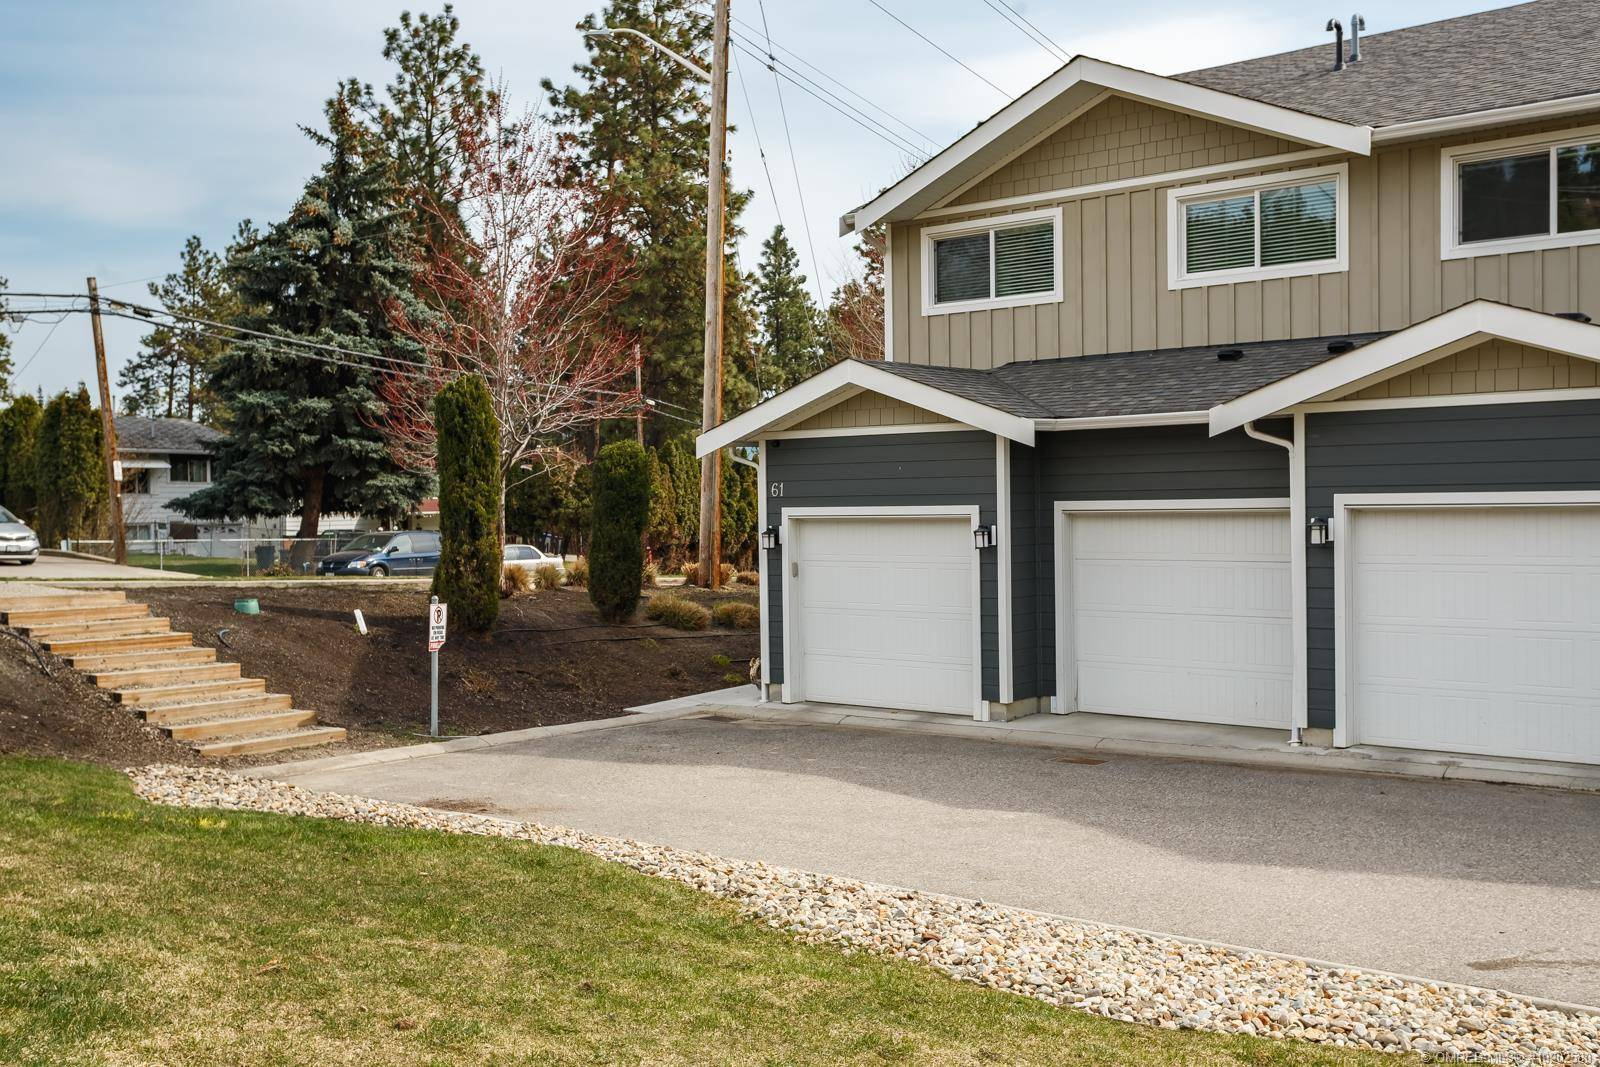 Townhouse for sale at 600 Boynton Pl Unit 61 Kelowna British Columbia - MLS: 10202580